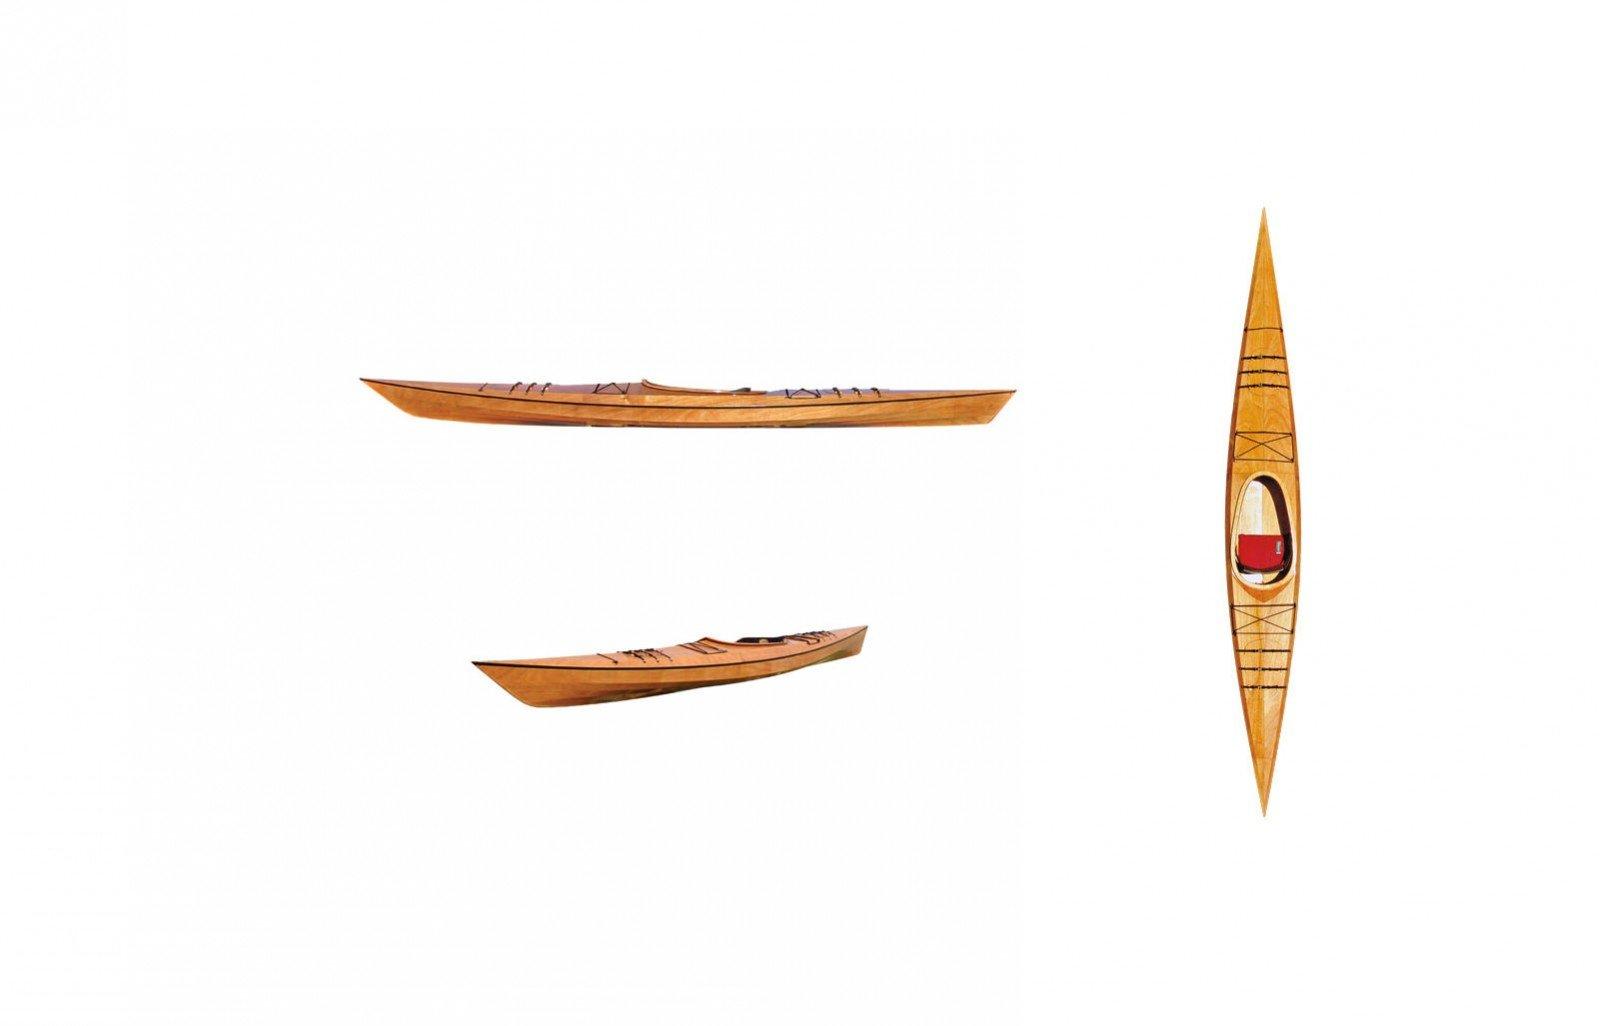 Kit Build Kayak Main 1600x1026 - Borealis XL Kit Build Kayak